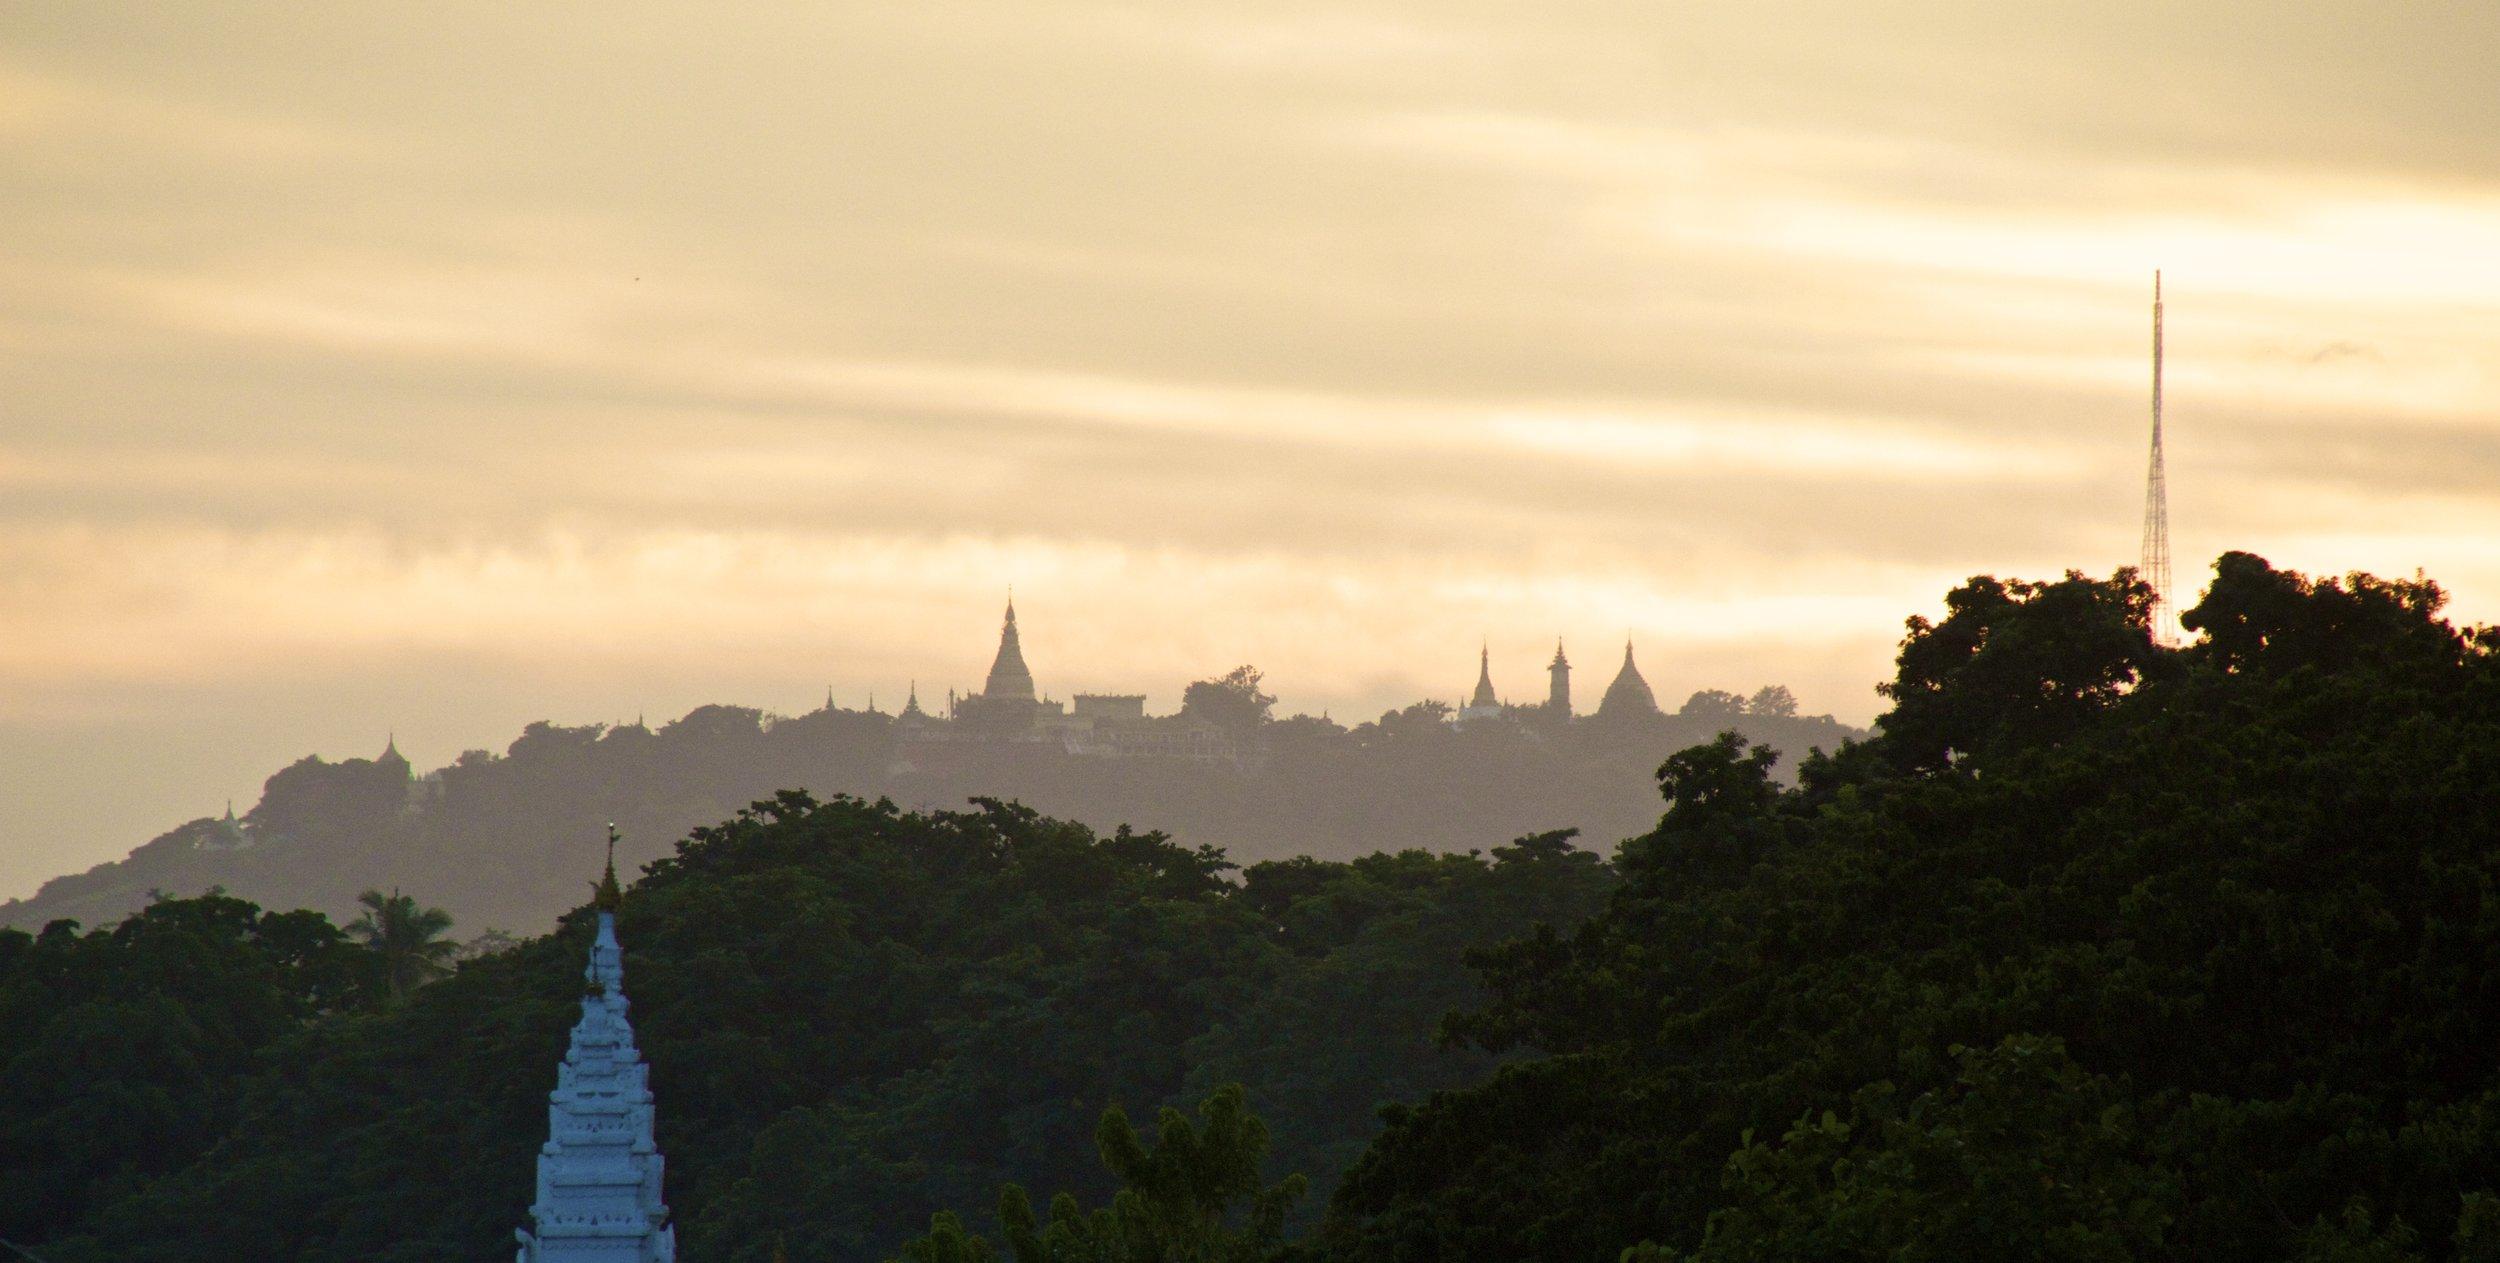 U Bein Bridge Mandalay Burma Myanmar 8.jpg